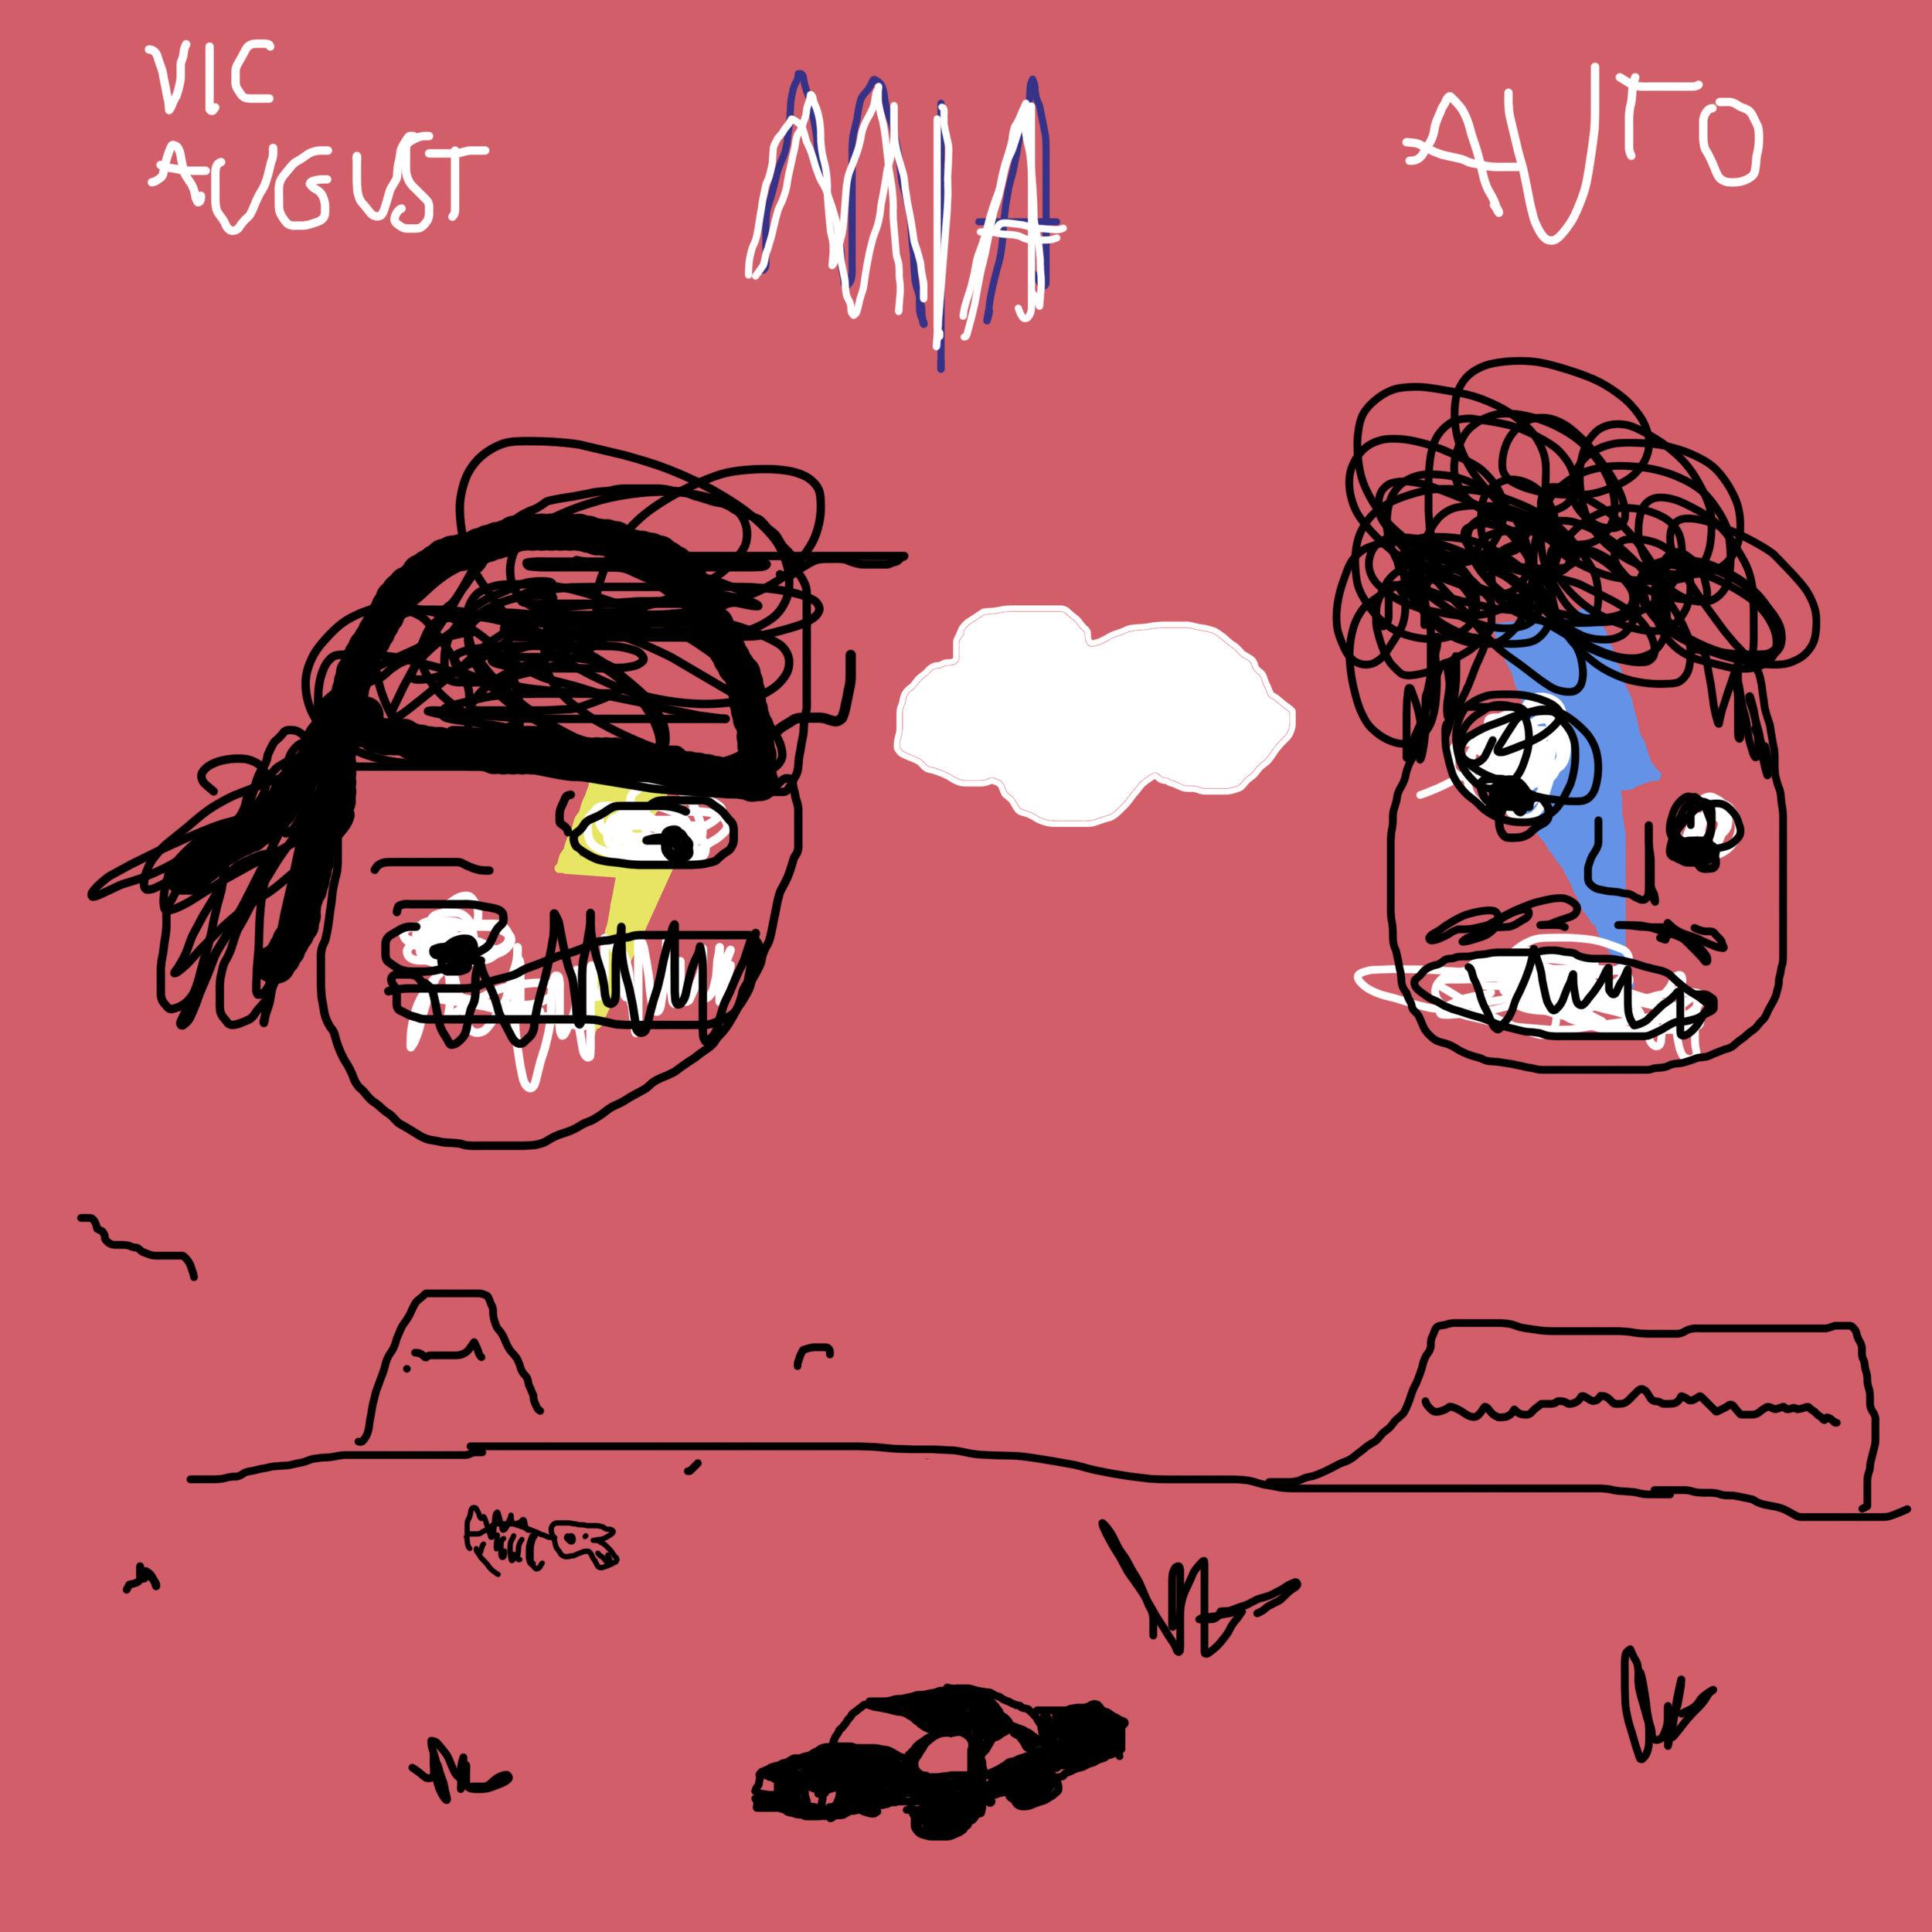 WVS037 - Vic August - MIA featuring Auto - Artwork.jpg